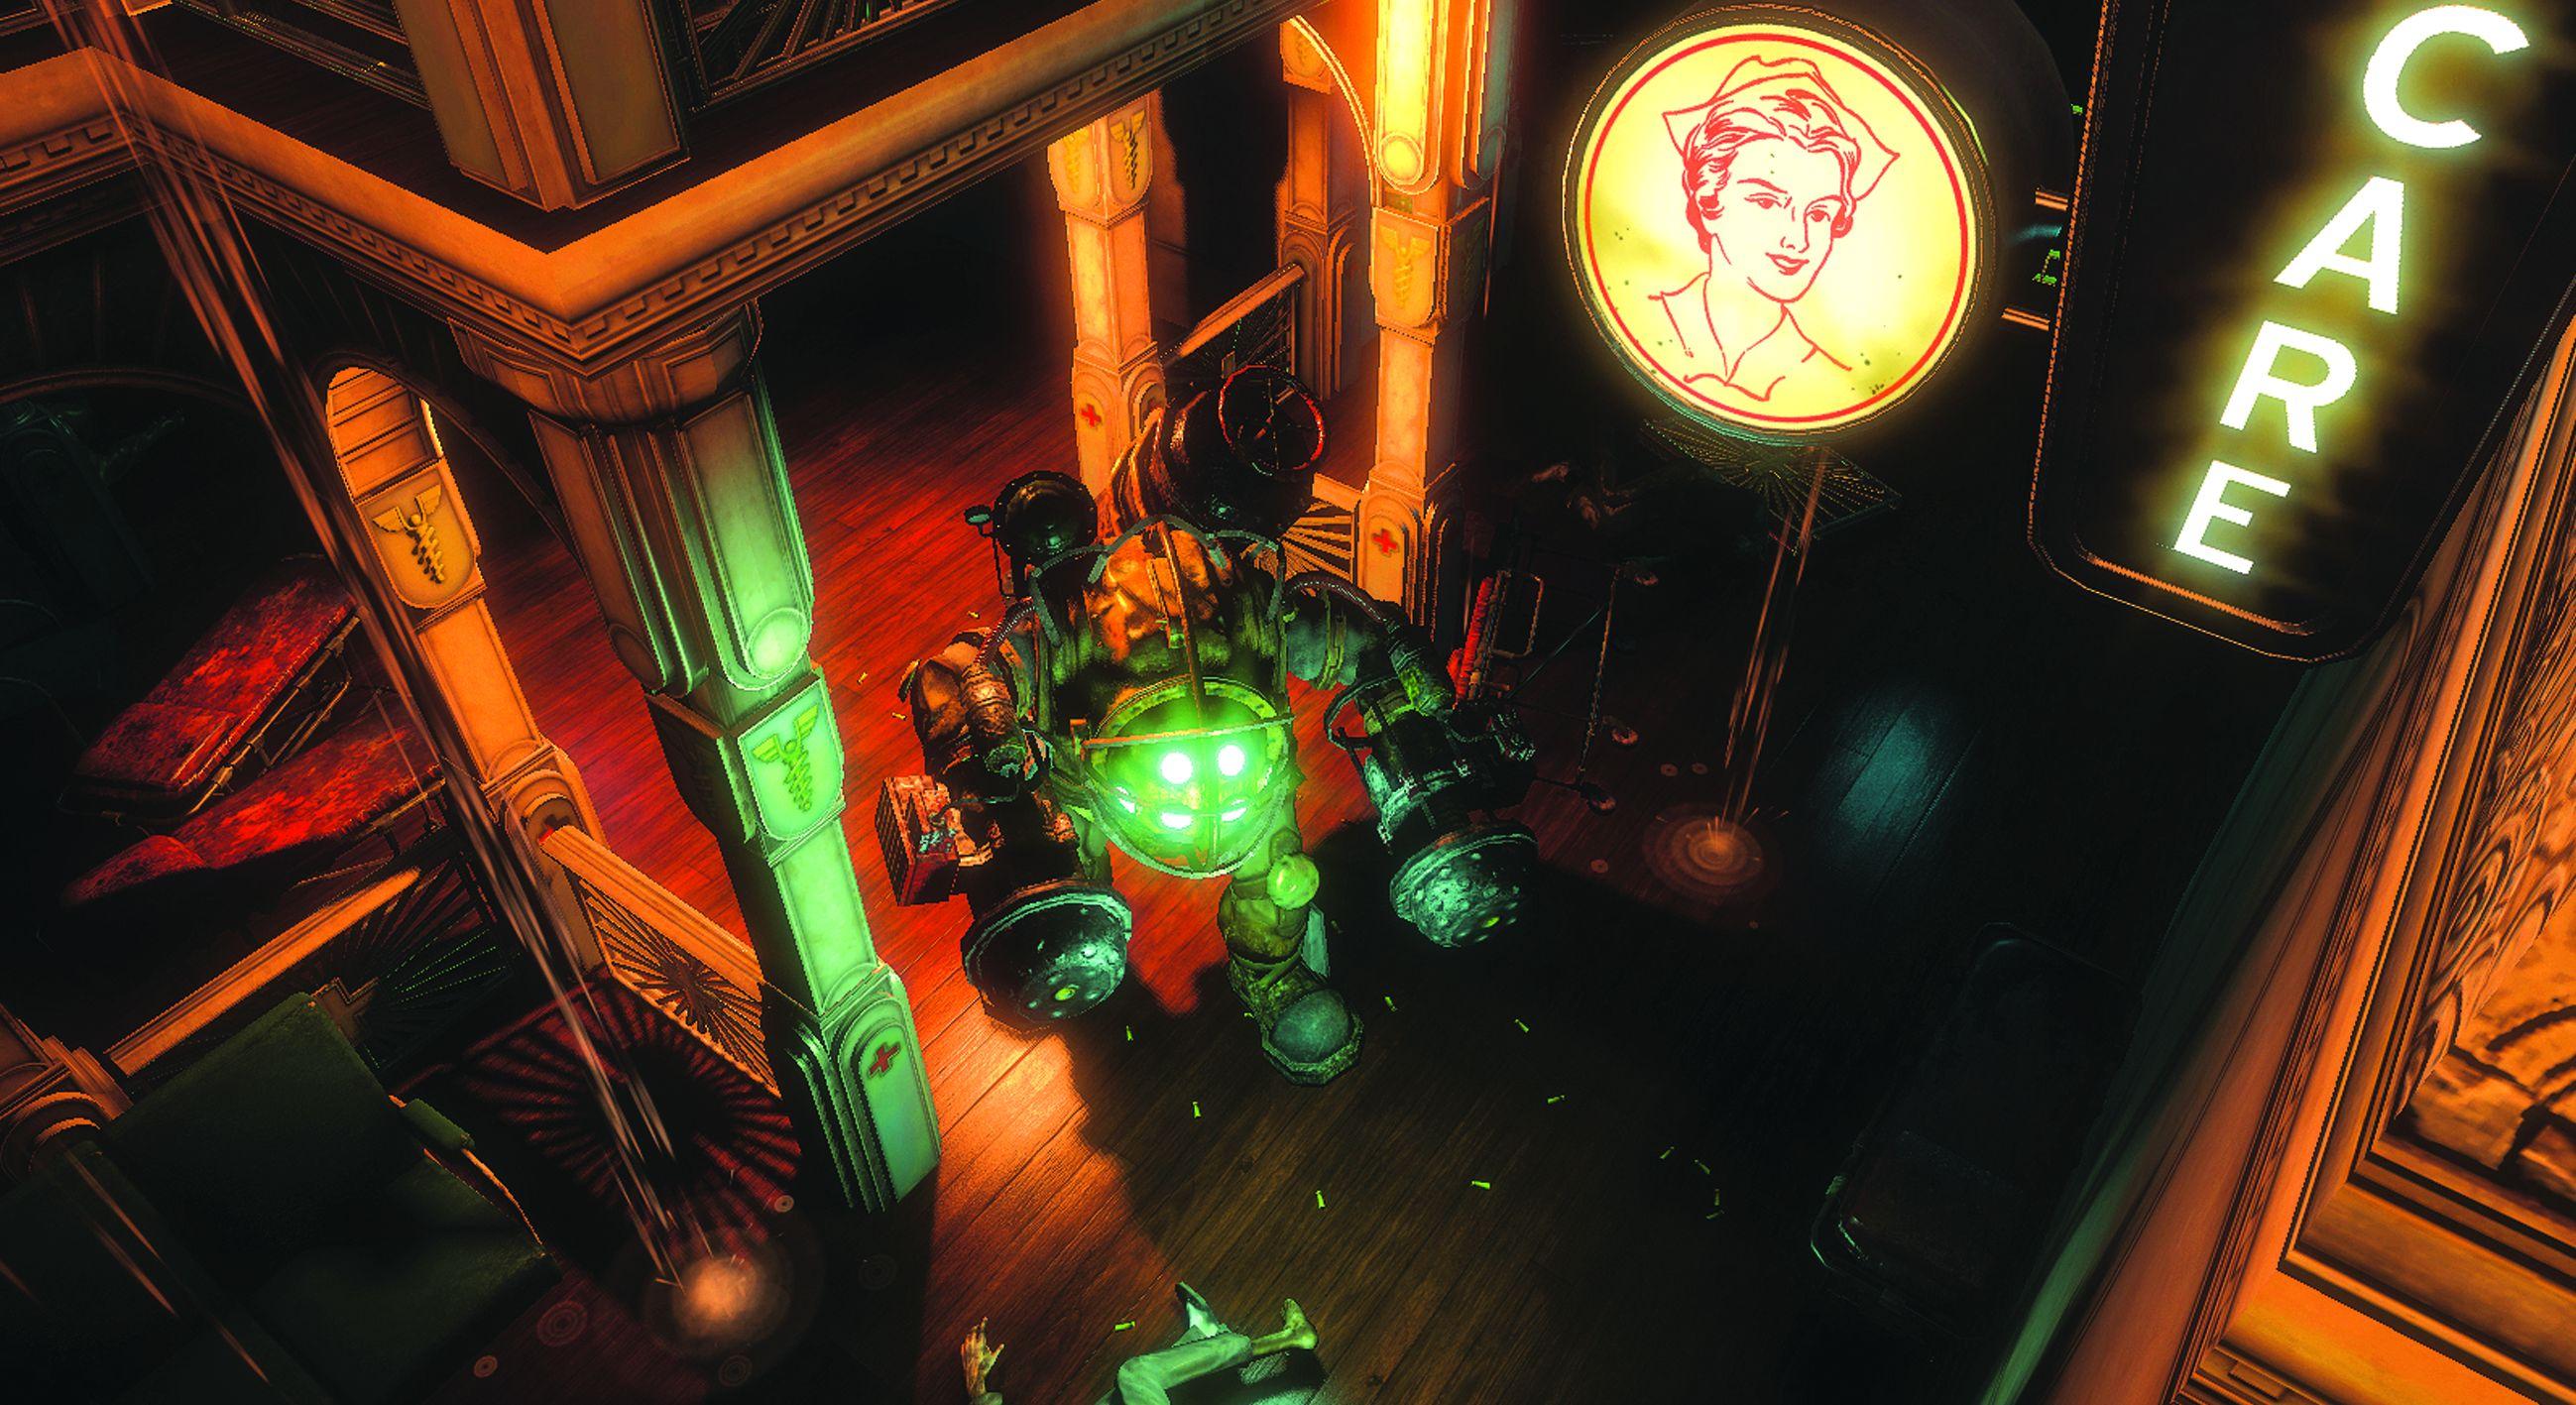 Archivo:Bioshock.jpg